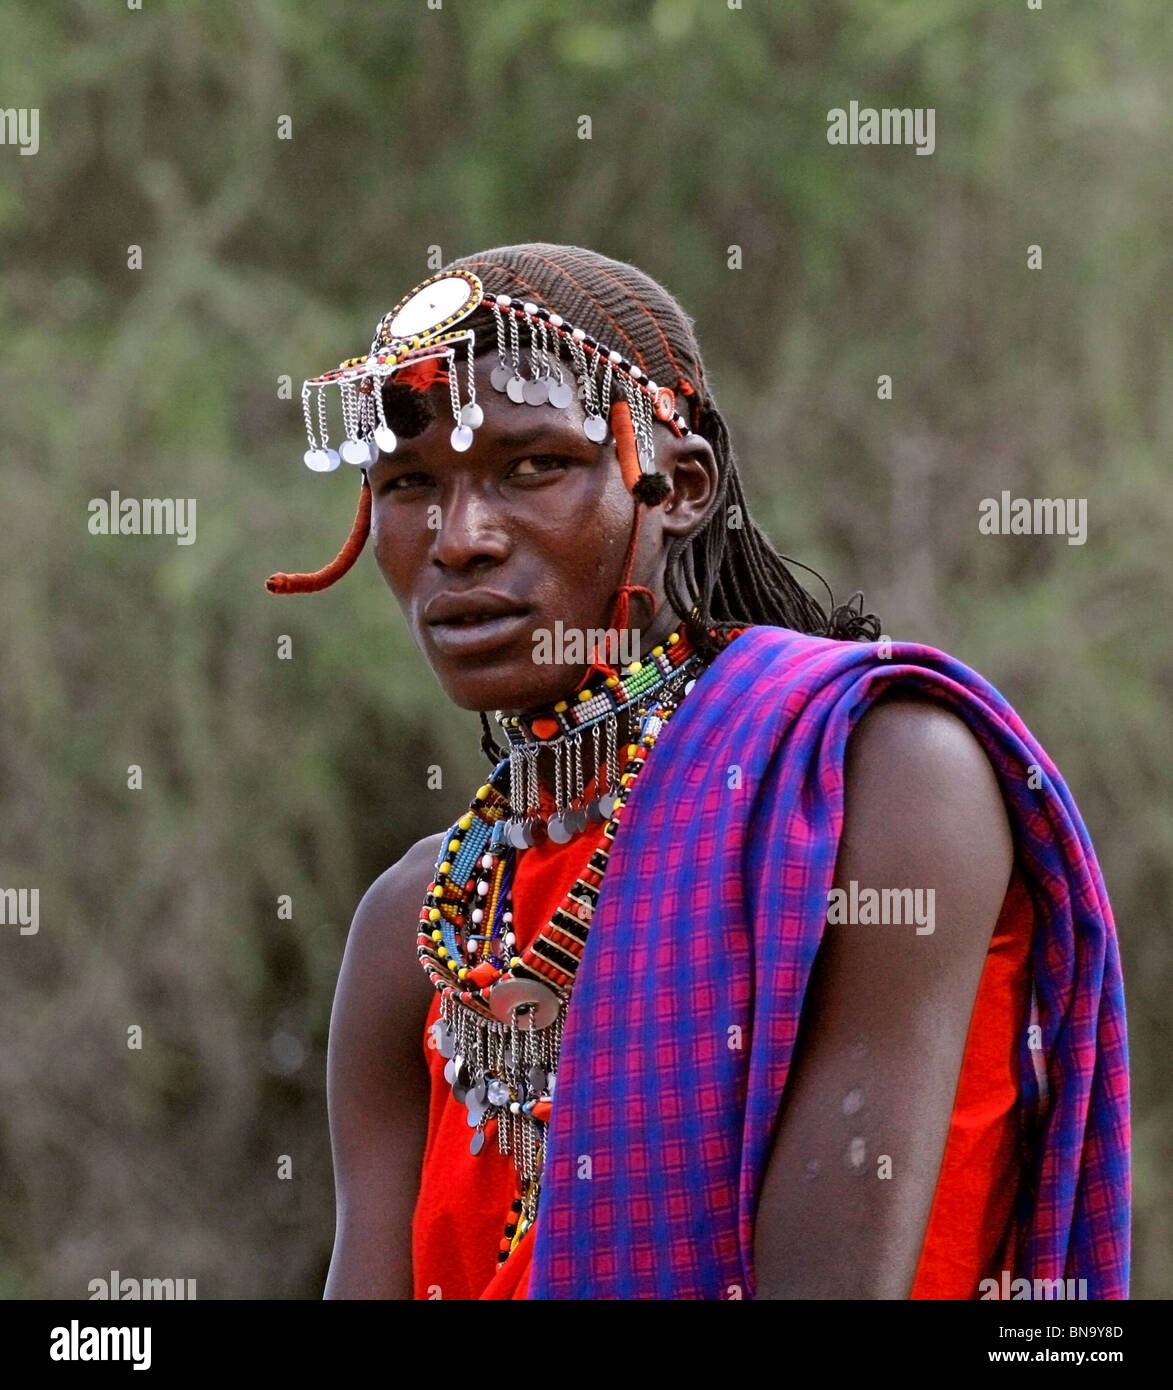 A handsome Masai warrior portrait shot taken in Masai Mara National Reserve , Kenya - Stock Image